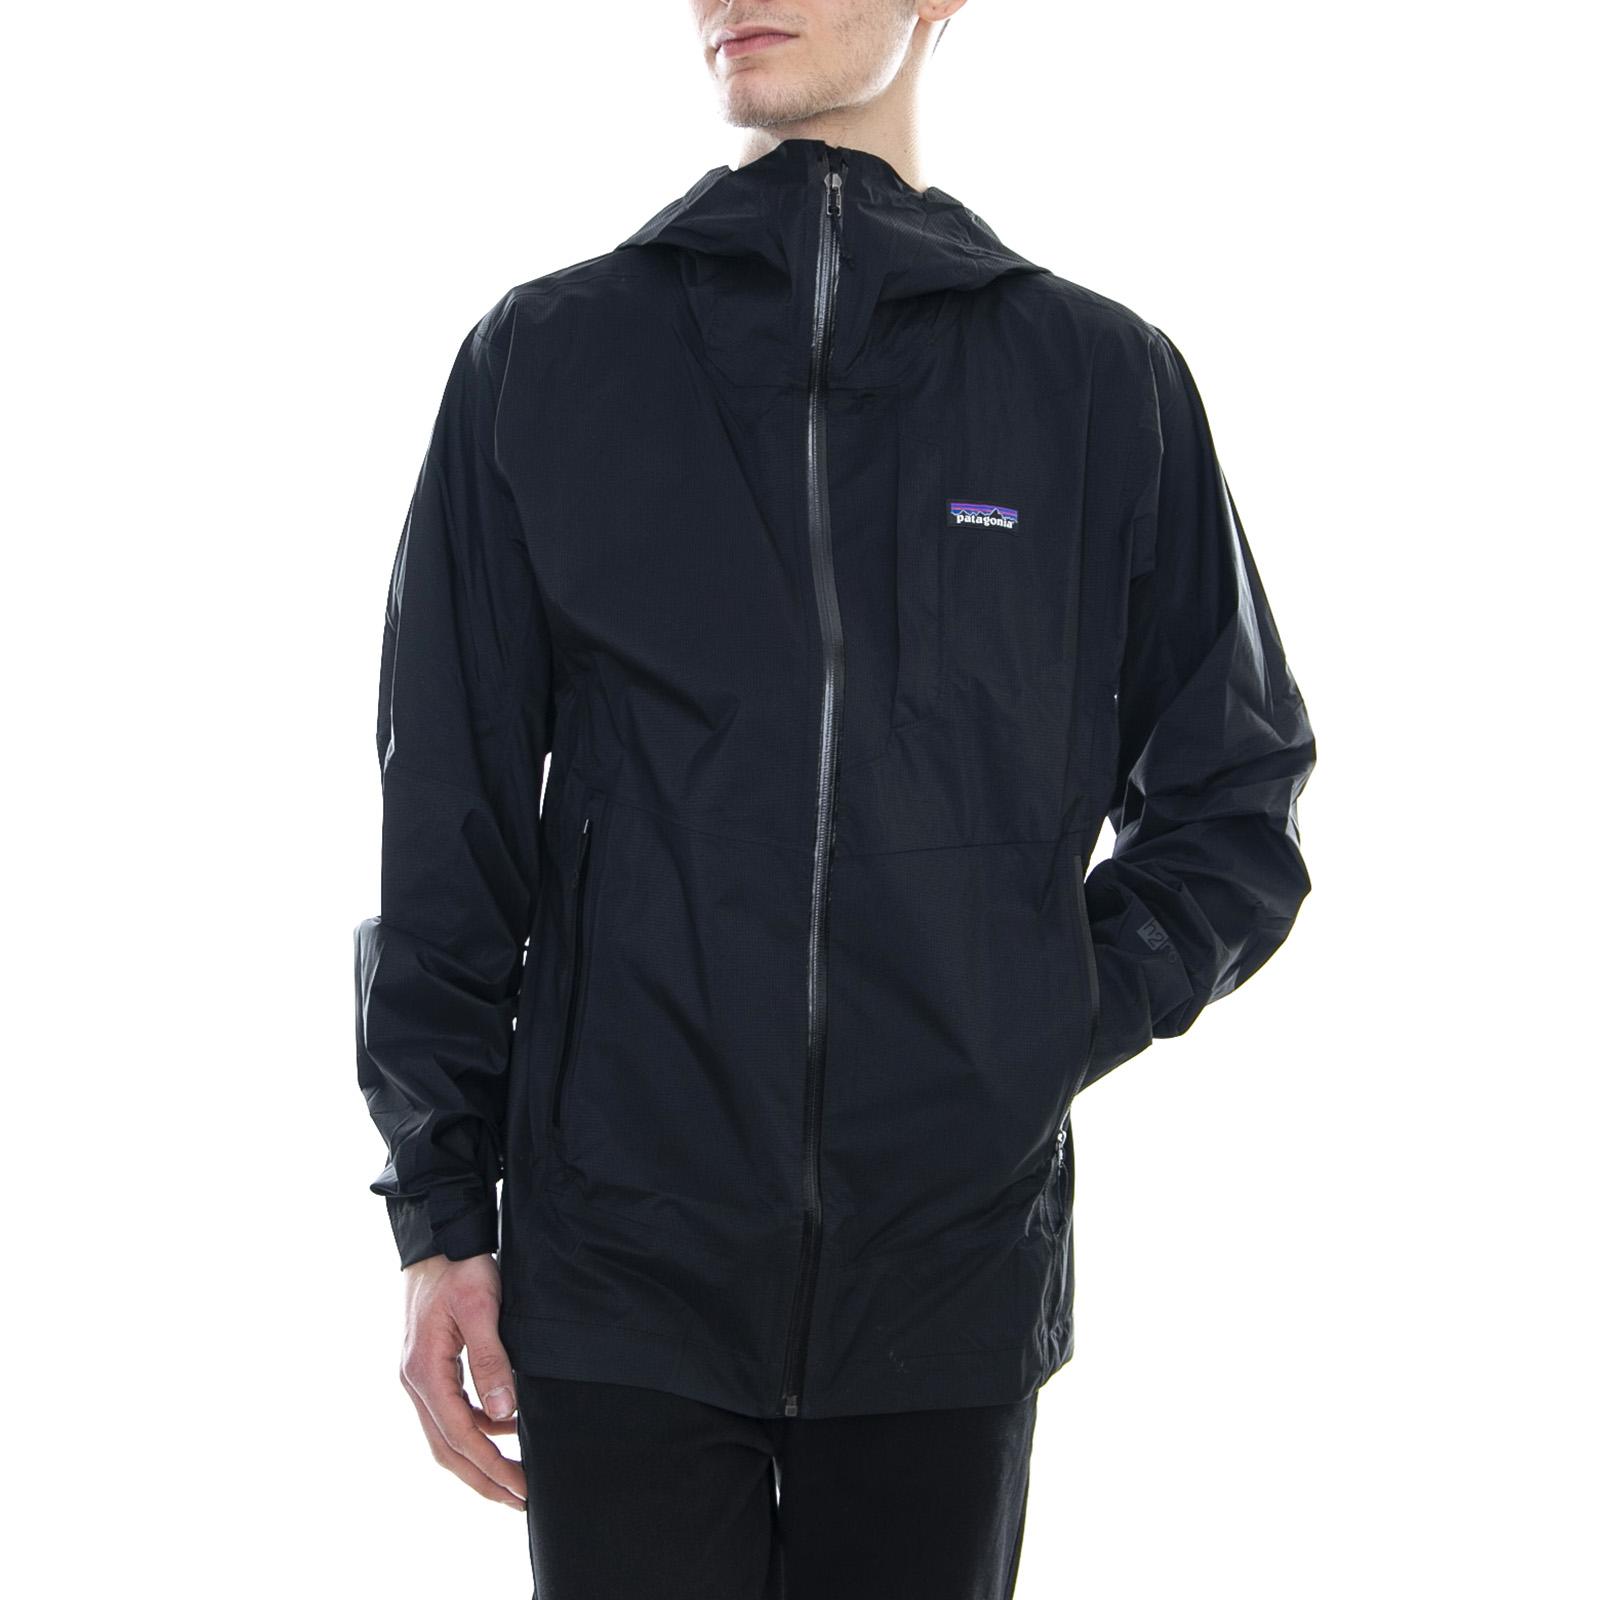 84801 Patagonia Men/'s Stretch Rainshadow Jacket size Medium